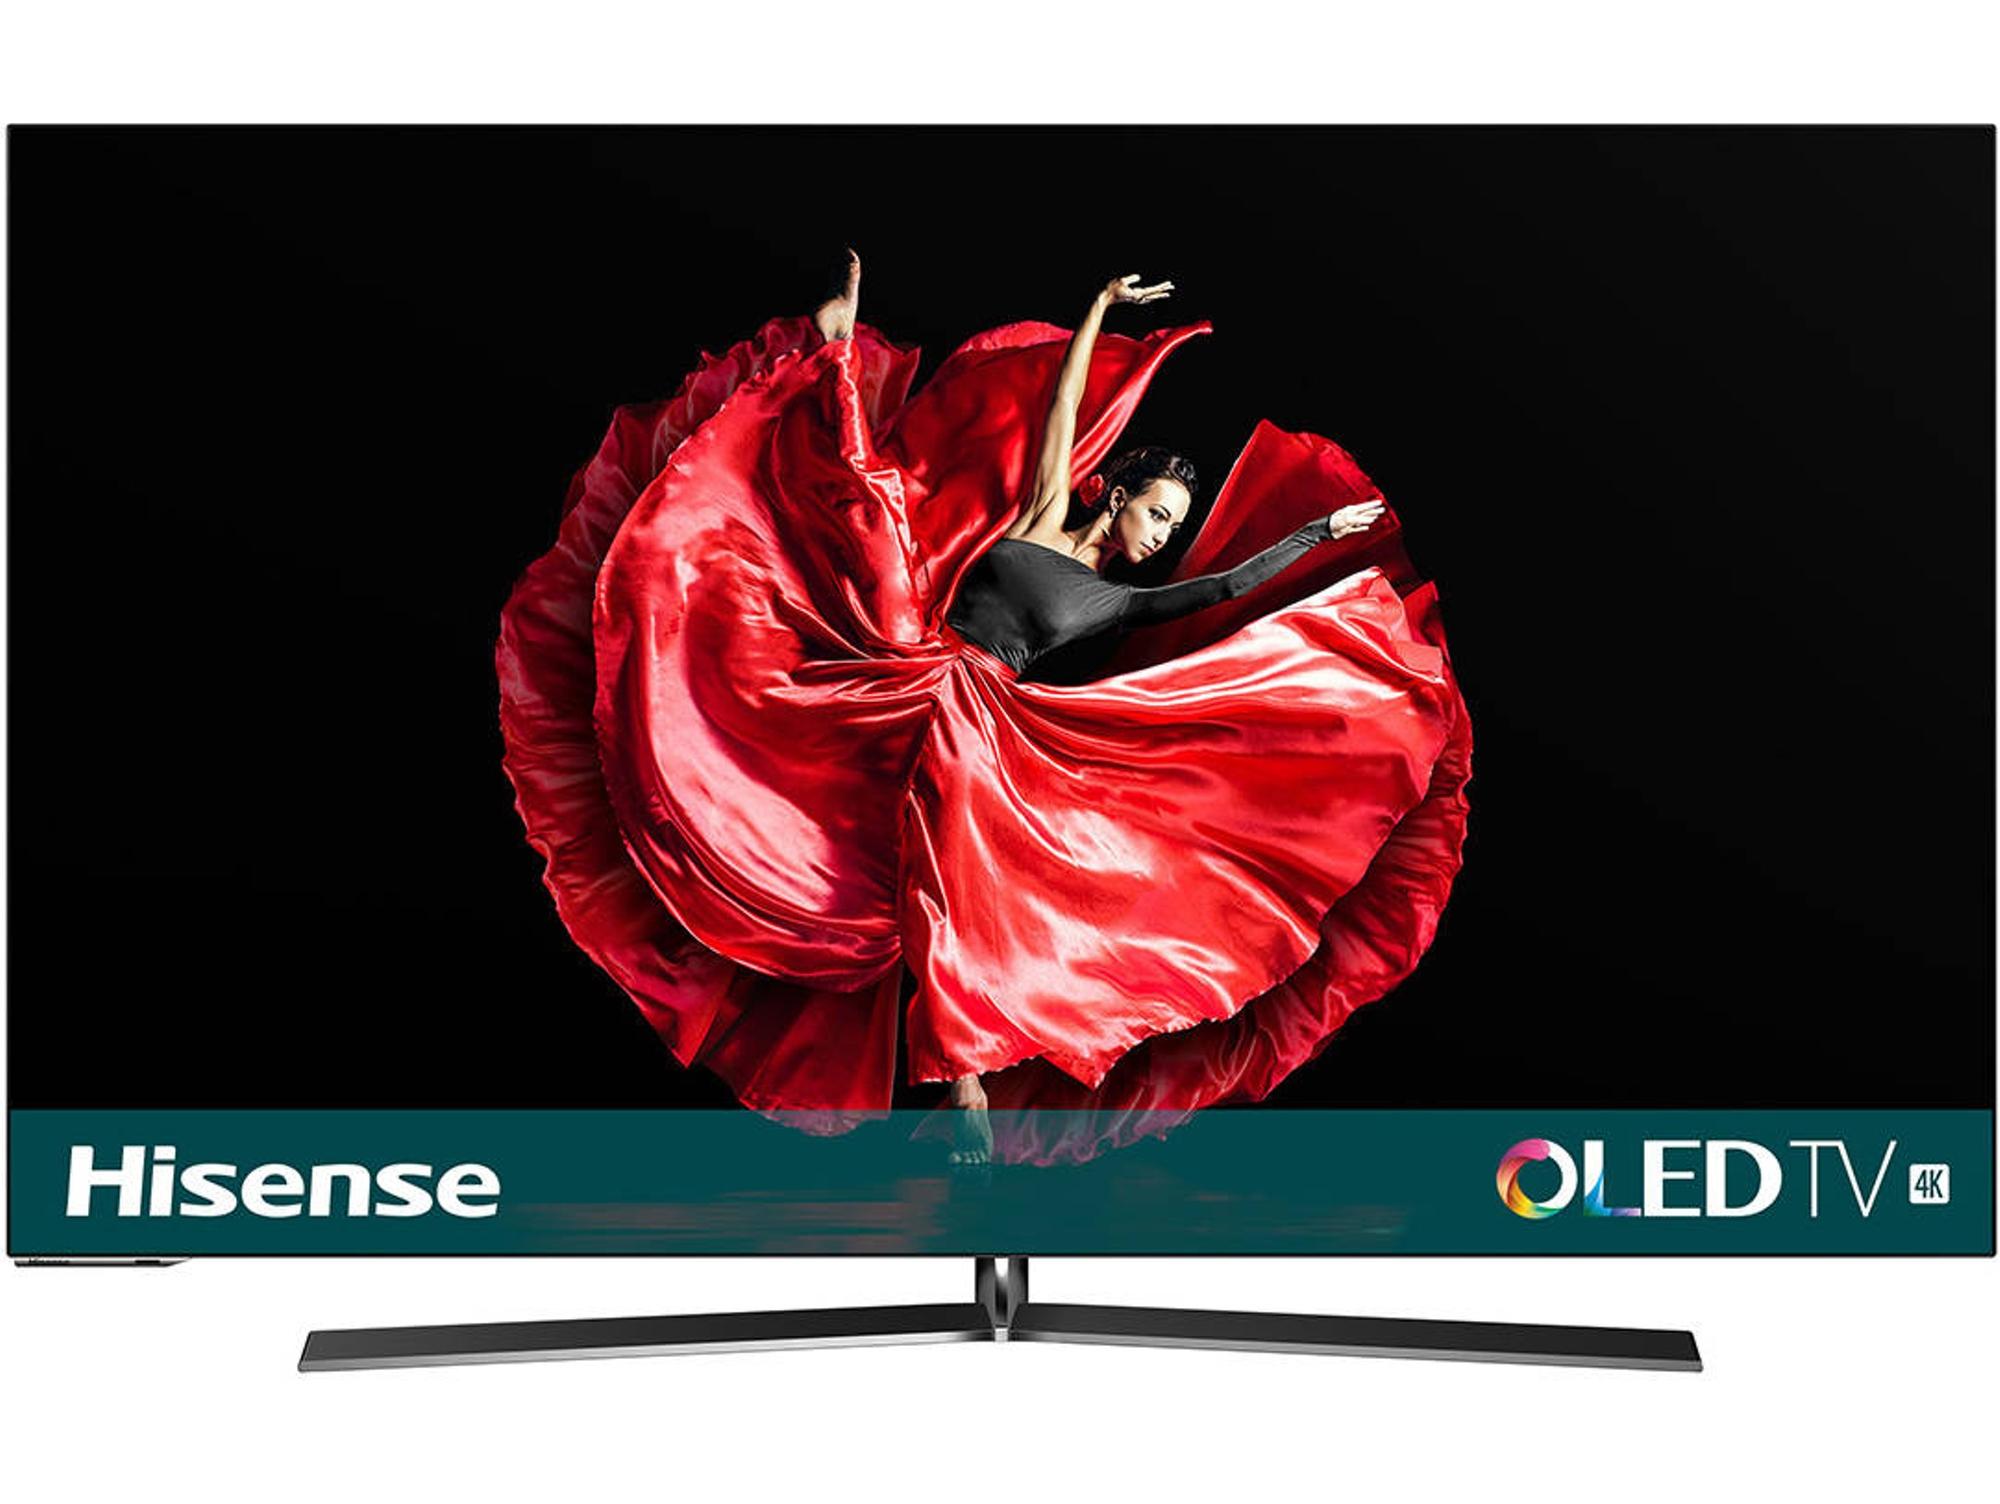 TV HISENSE 55O8B (OLED - 55'' - 140 cm - 4K Ultra HD - Smart TV)   Worten.es